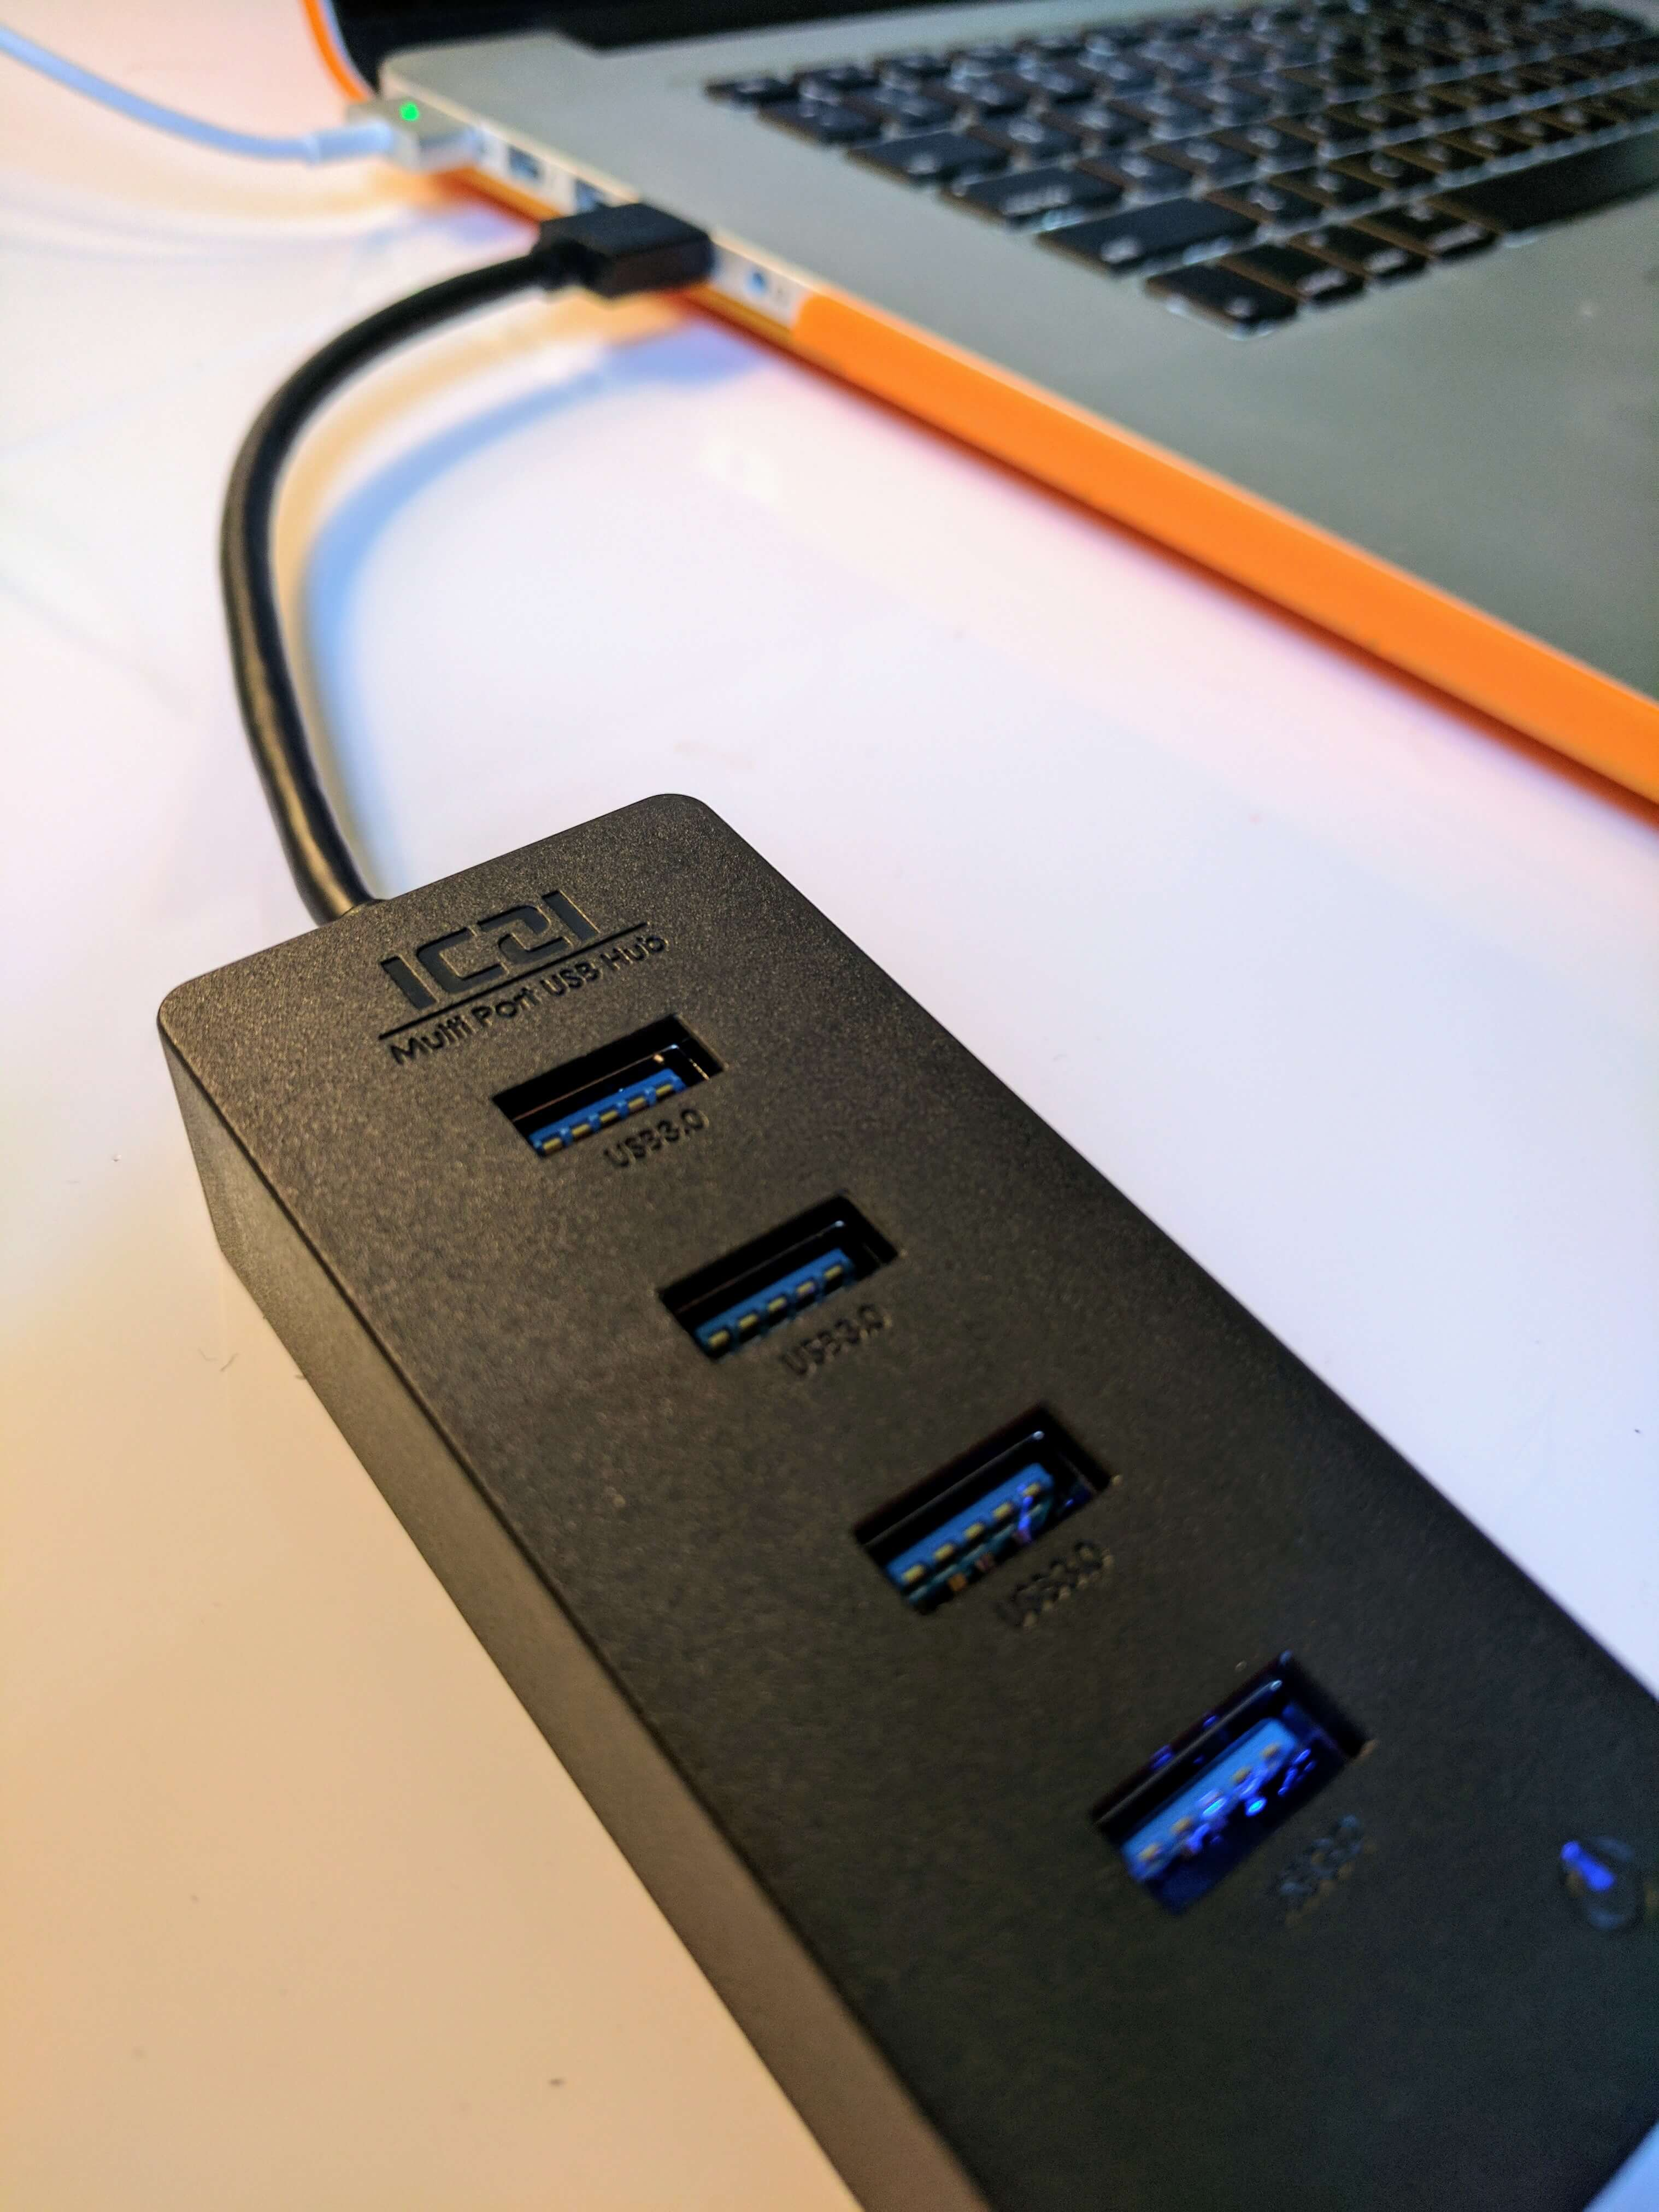 ICZI 4-Port USB Hub